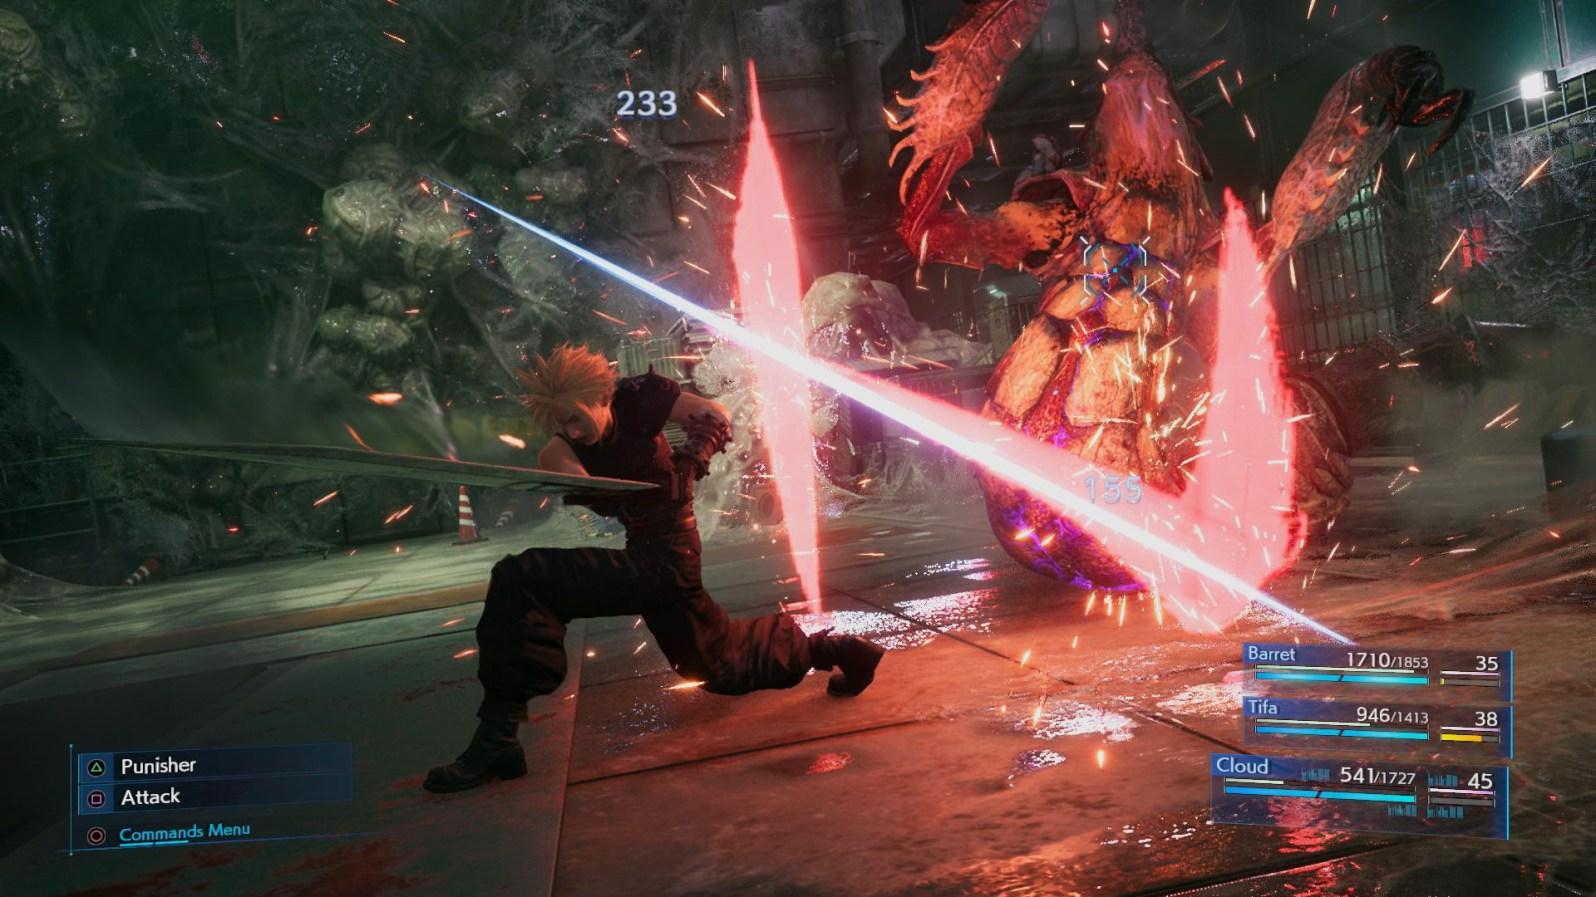 Quelle: Square Enix - Final Fantasy 7 Remake - Punisher-Mode